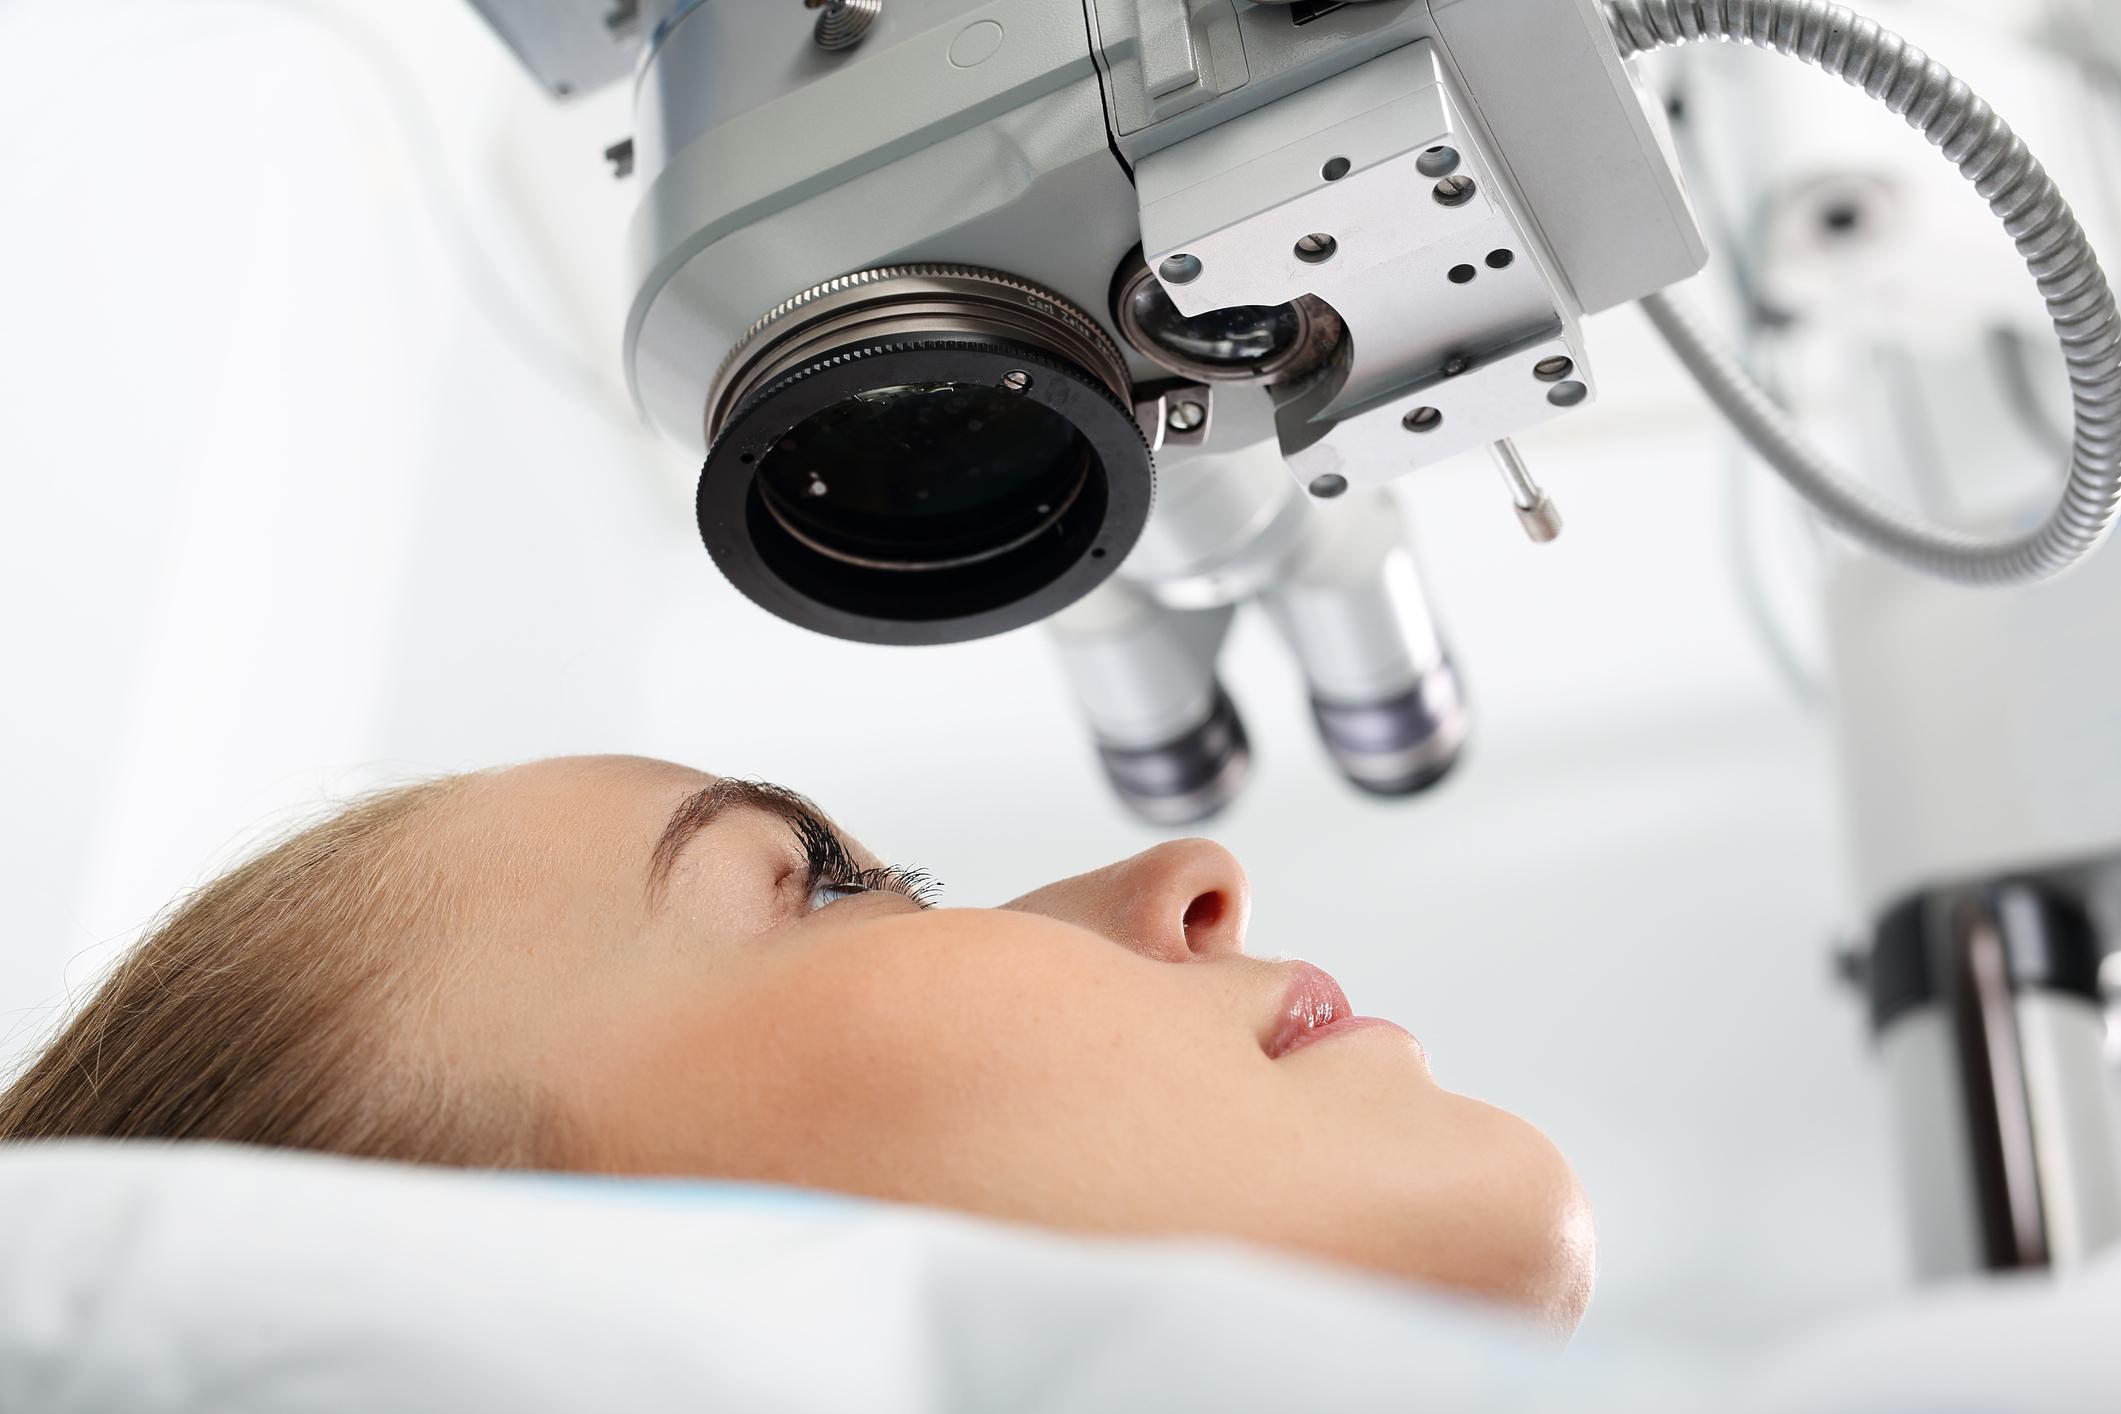 Patient undergoing eye surgery